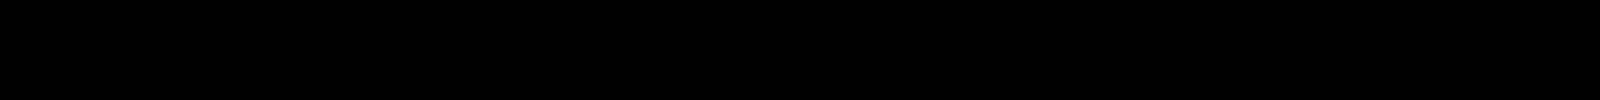 Litebulb 8 Bit Fontstruct